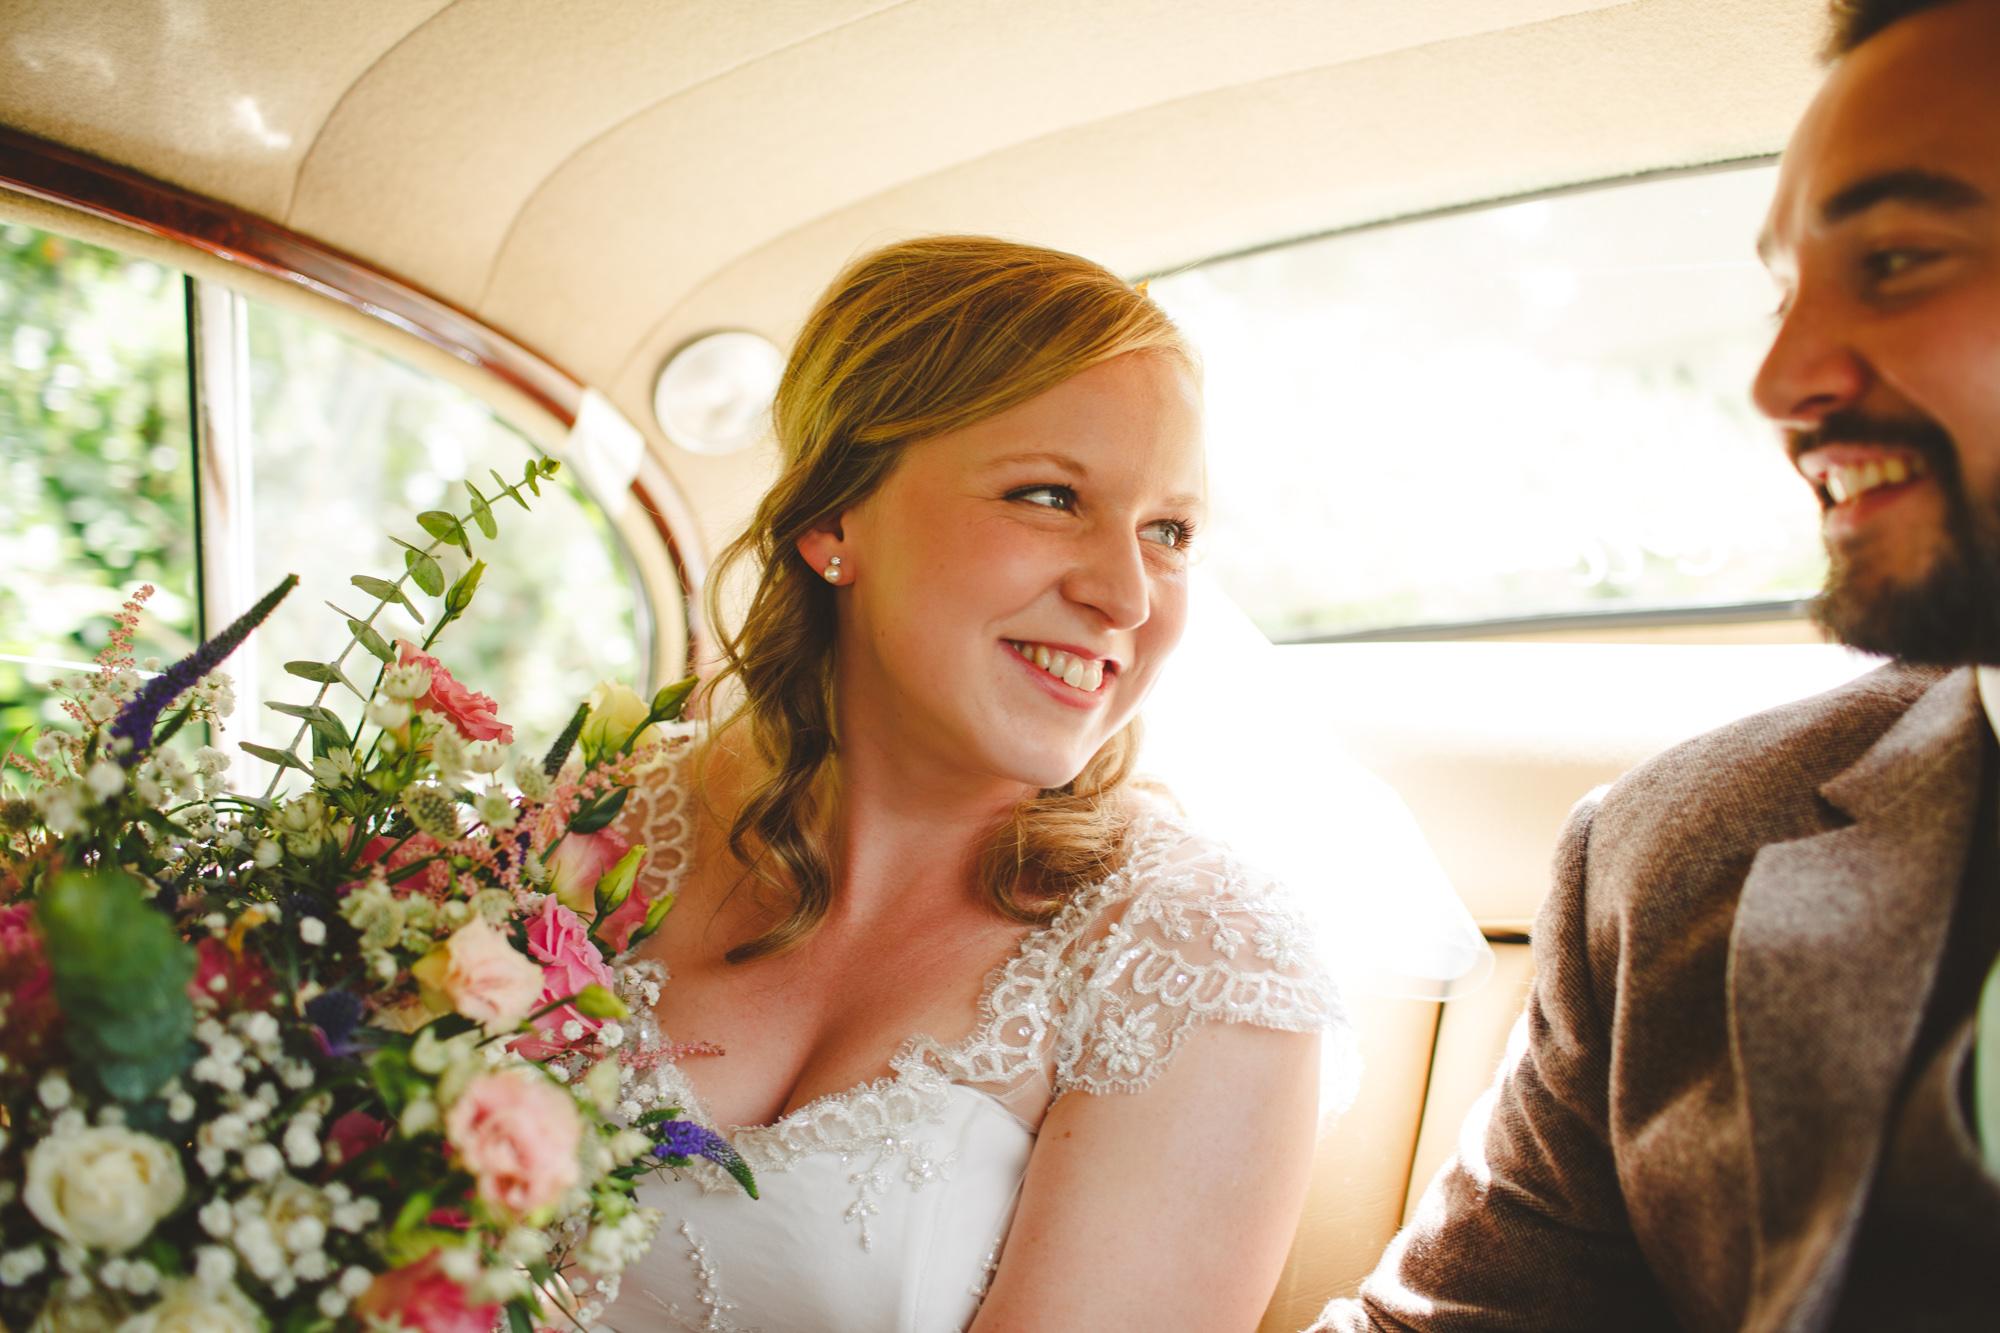 cornwall-alternative-wedding-photographer-beach-wedding-8.jpg